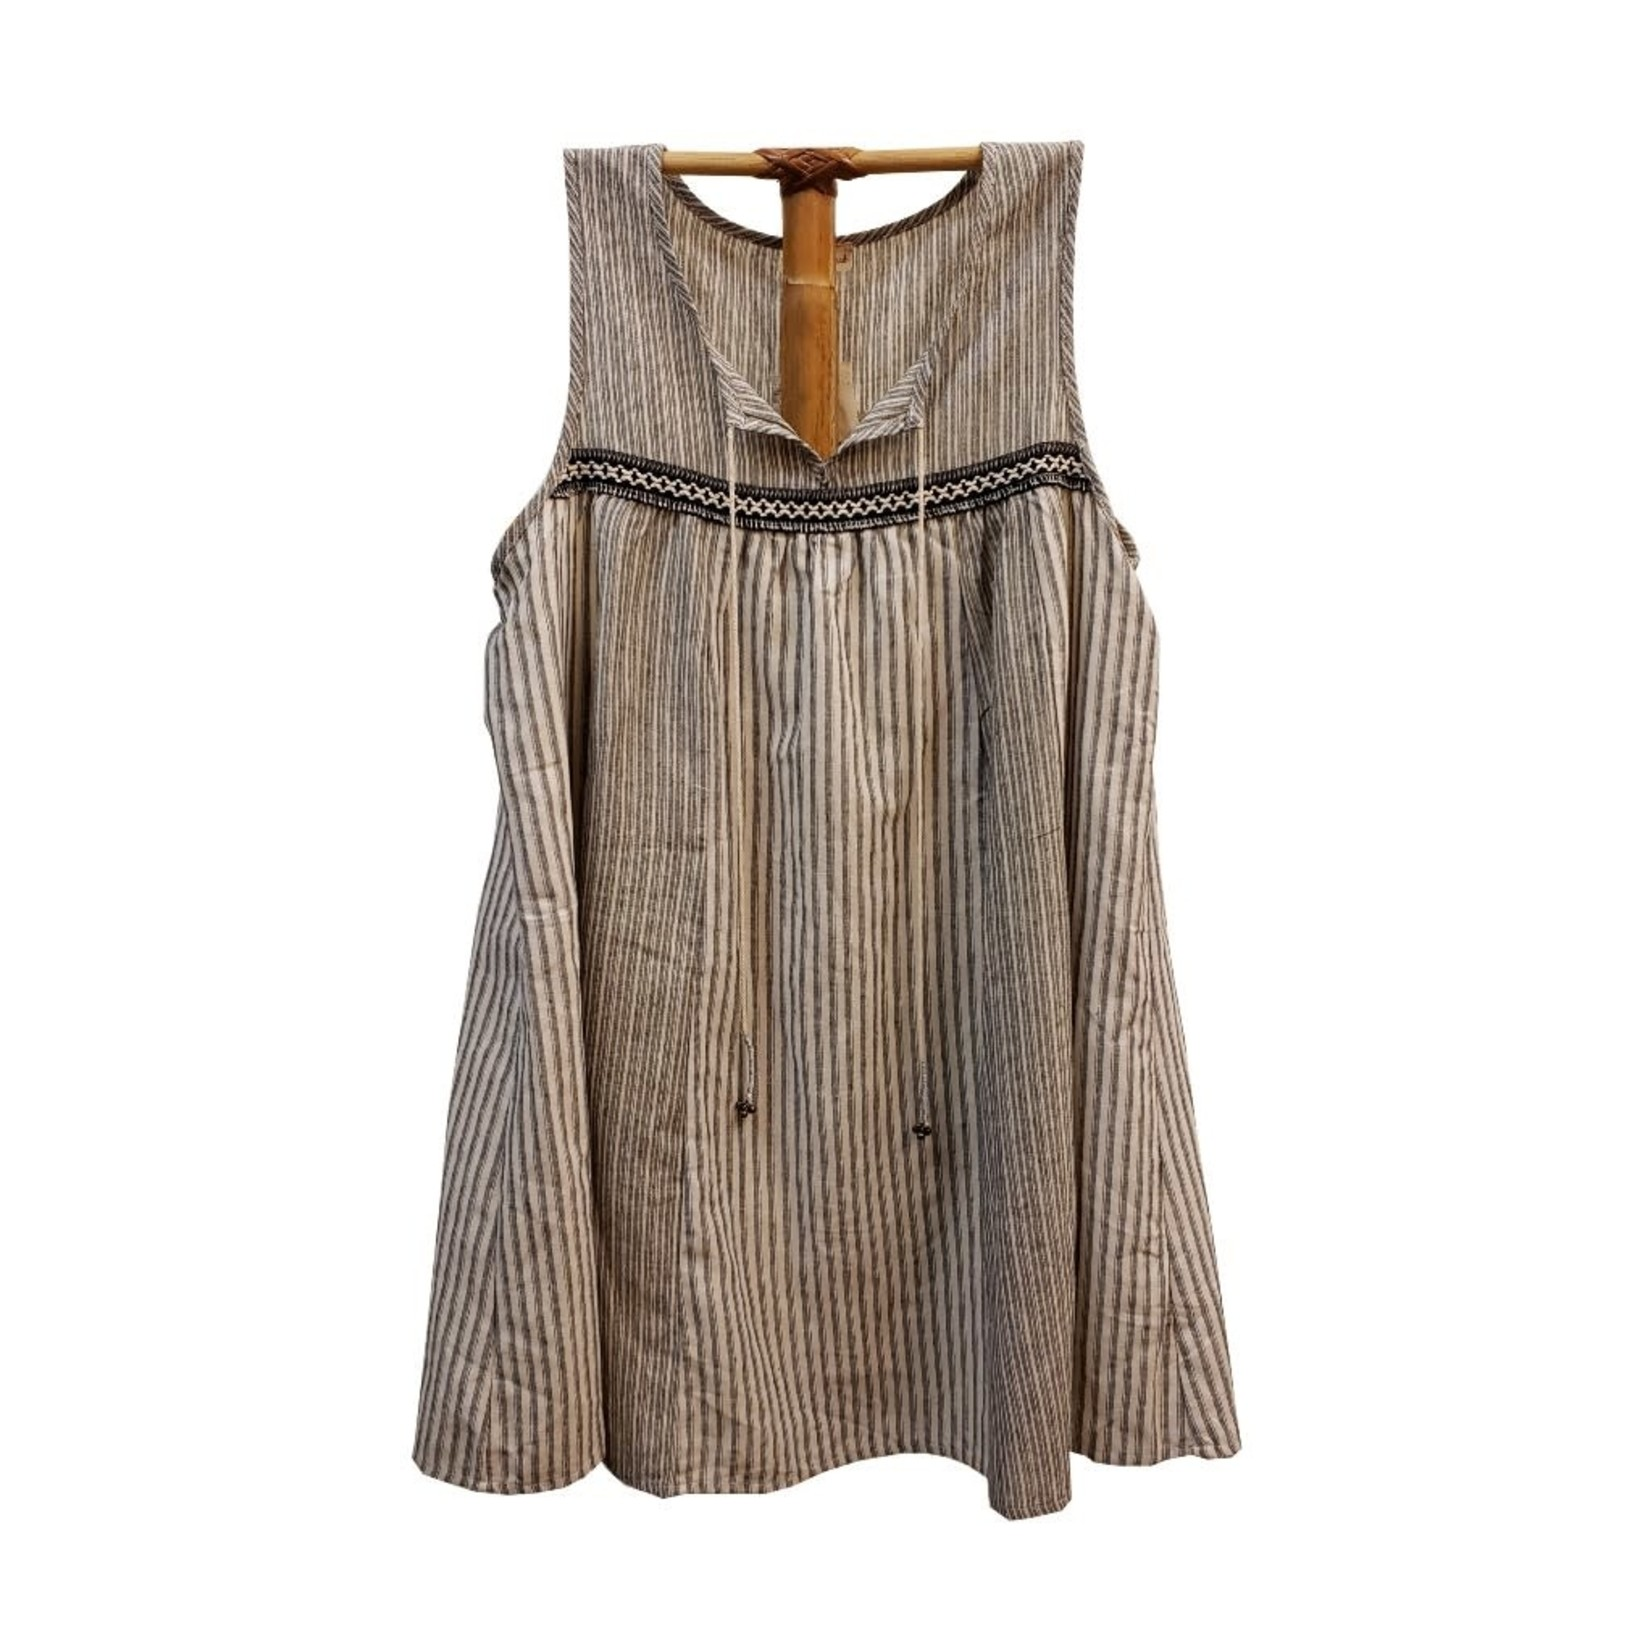 Hem & Thread Mixed Stripe Fringe Trim Dress Black/Ivory